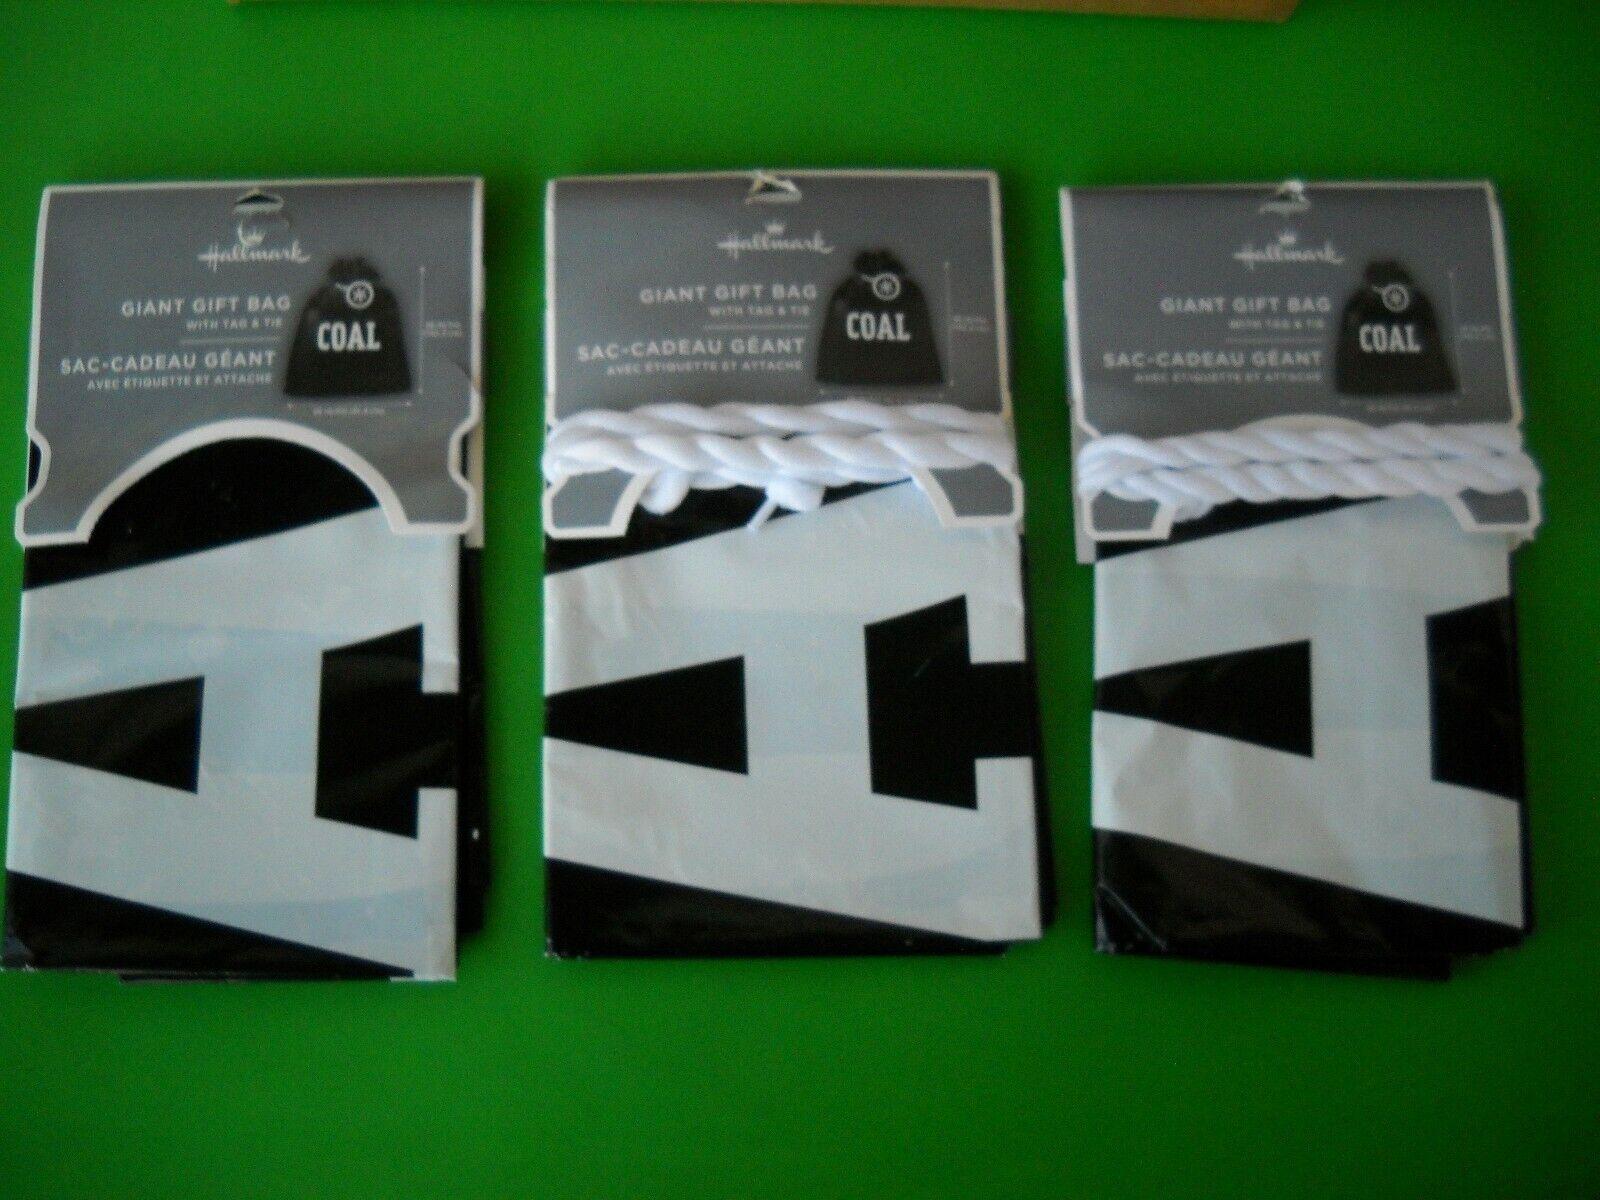 3X Hallmark Supersize It Giant Plastic Gift Bag - Christmas